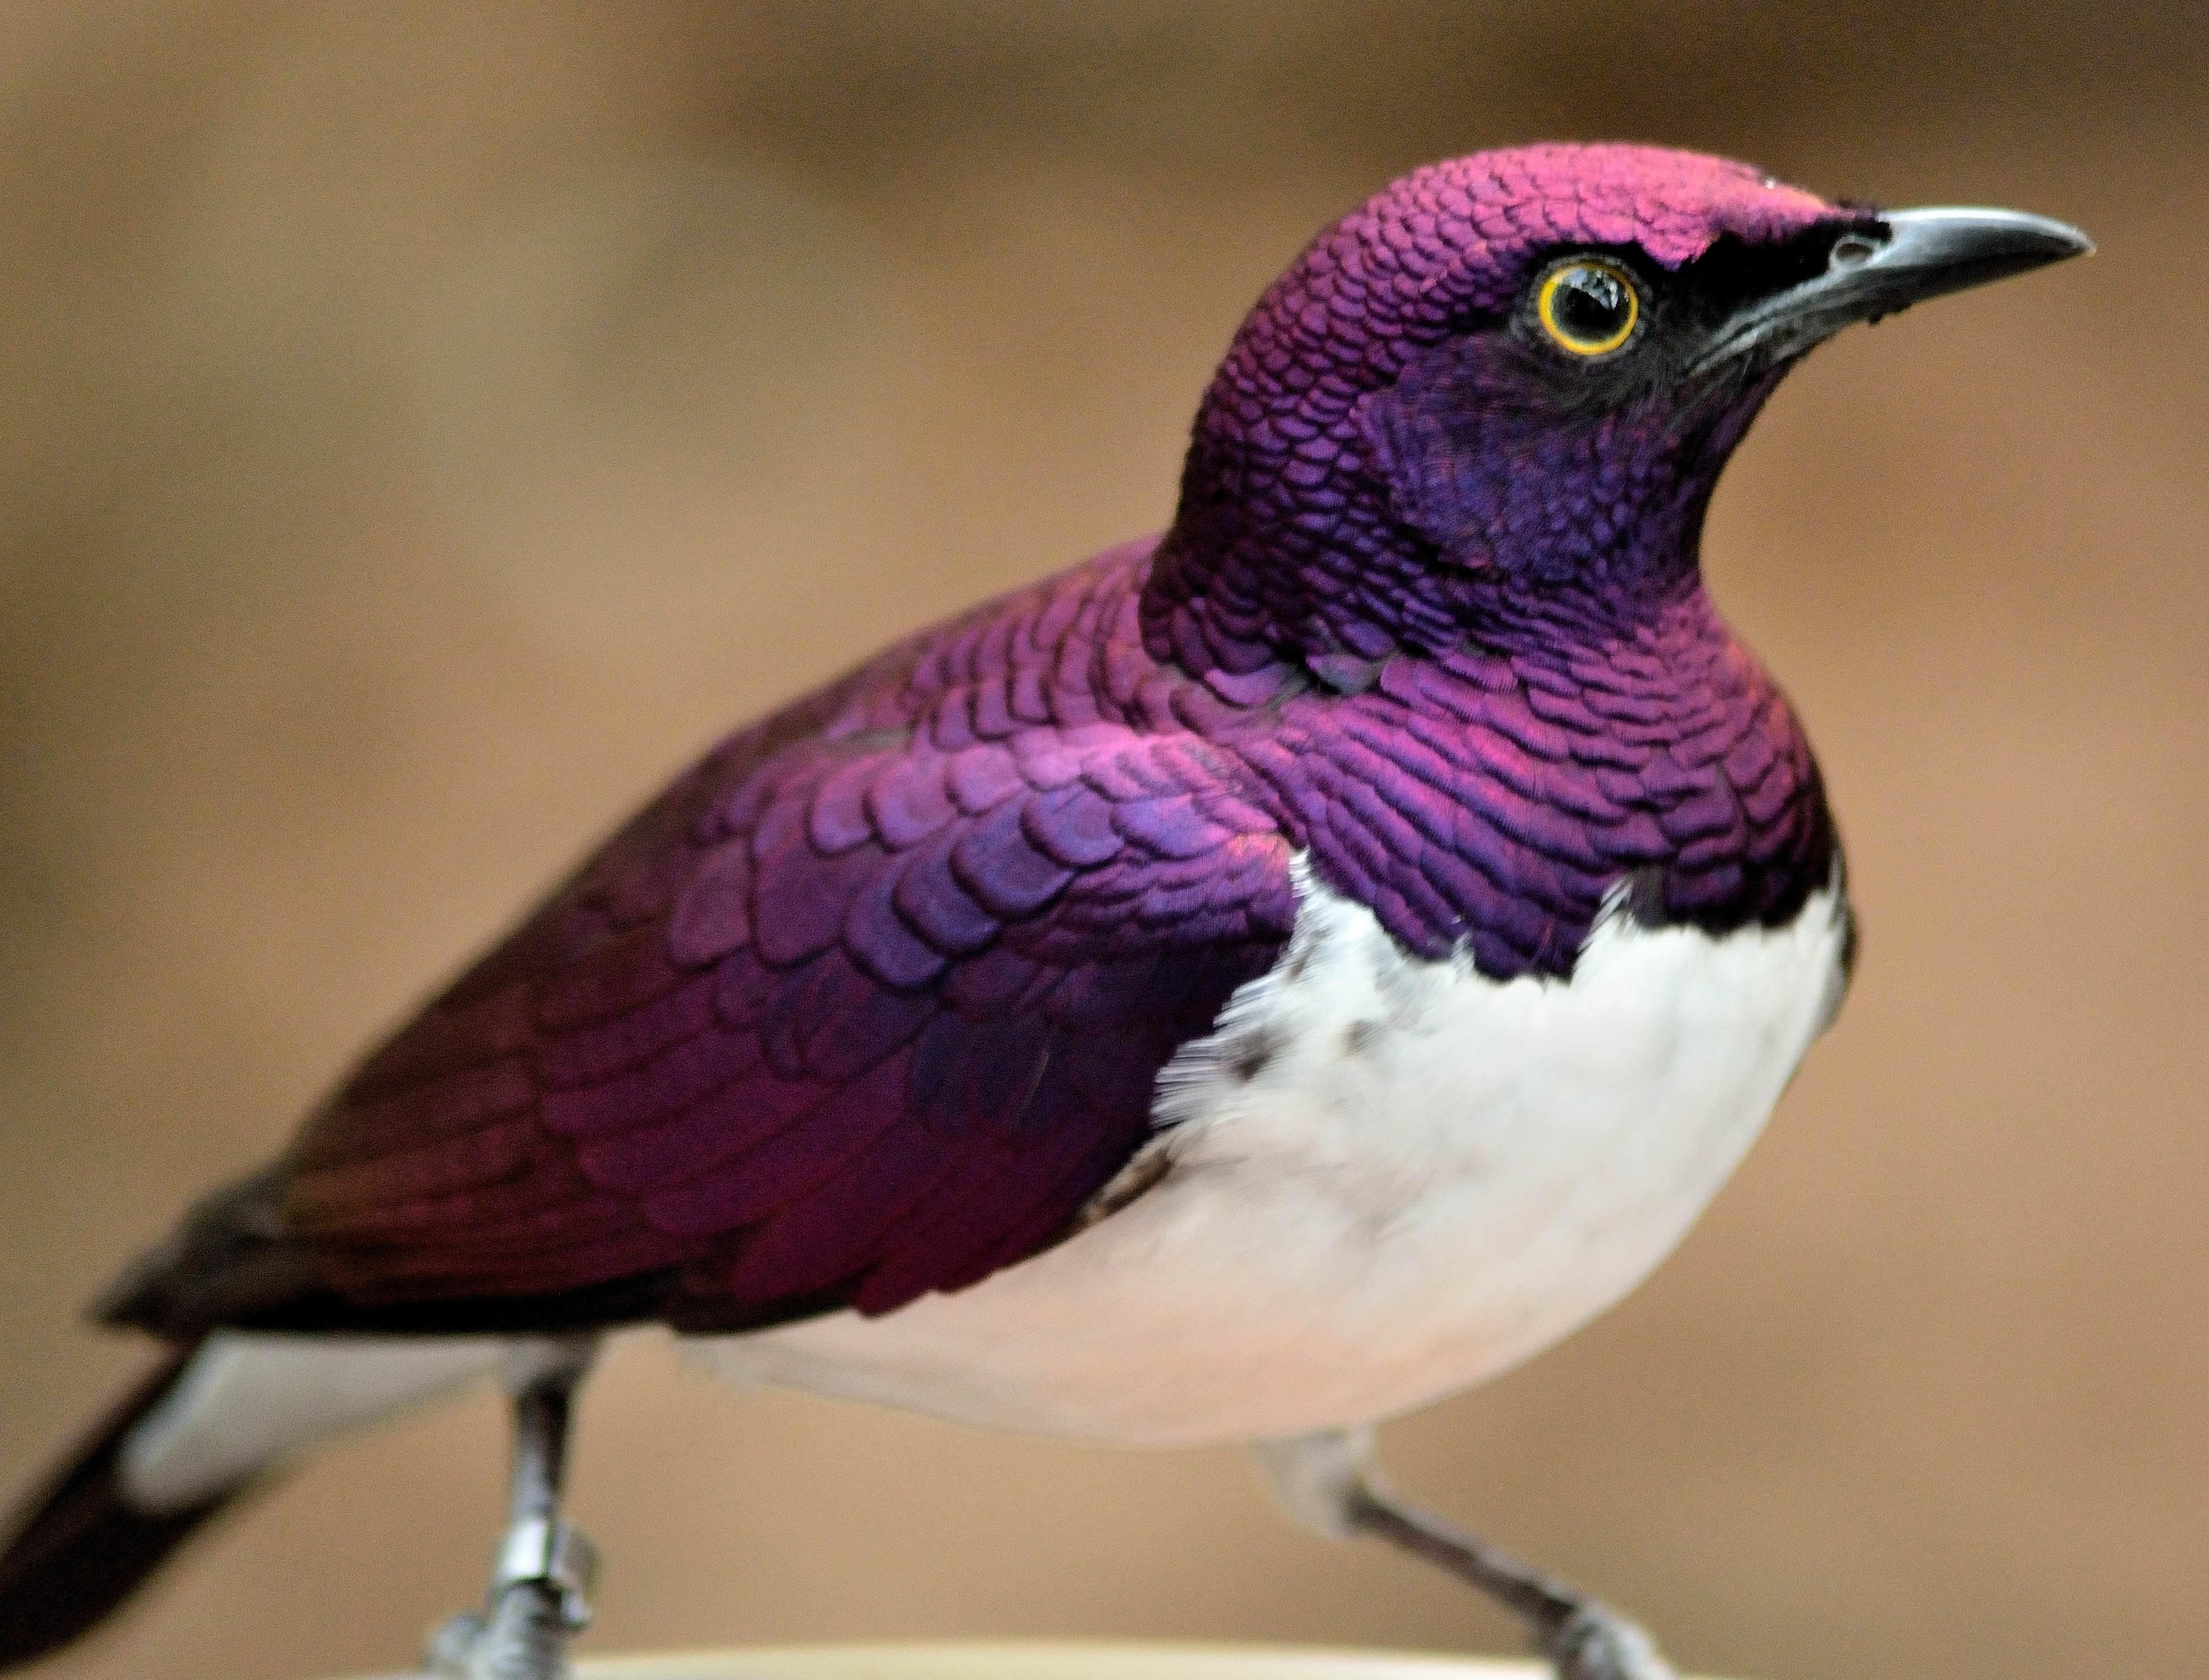 Beauty in birds - Album on Imgur